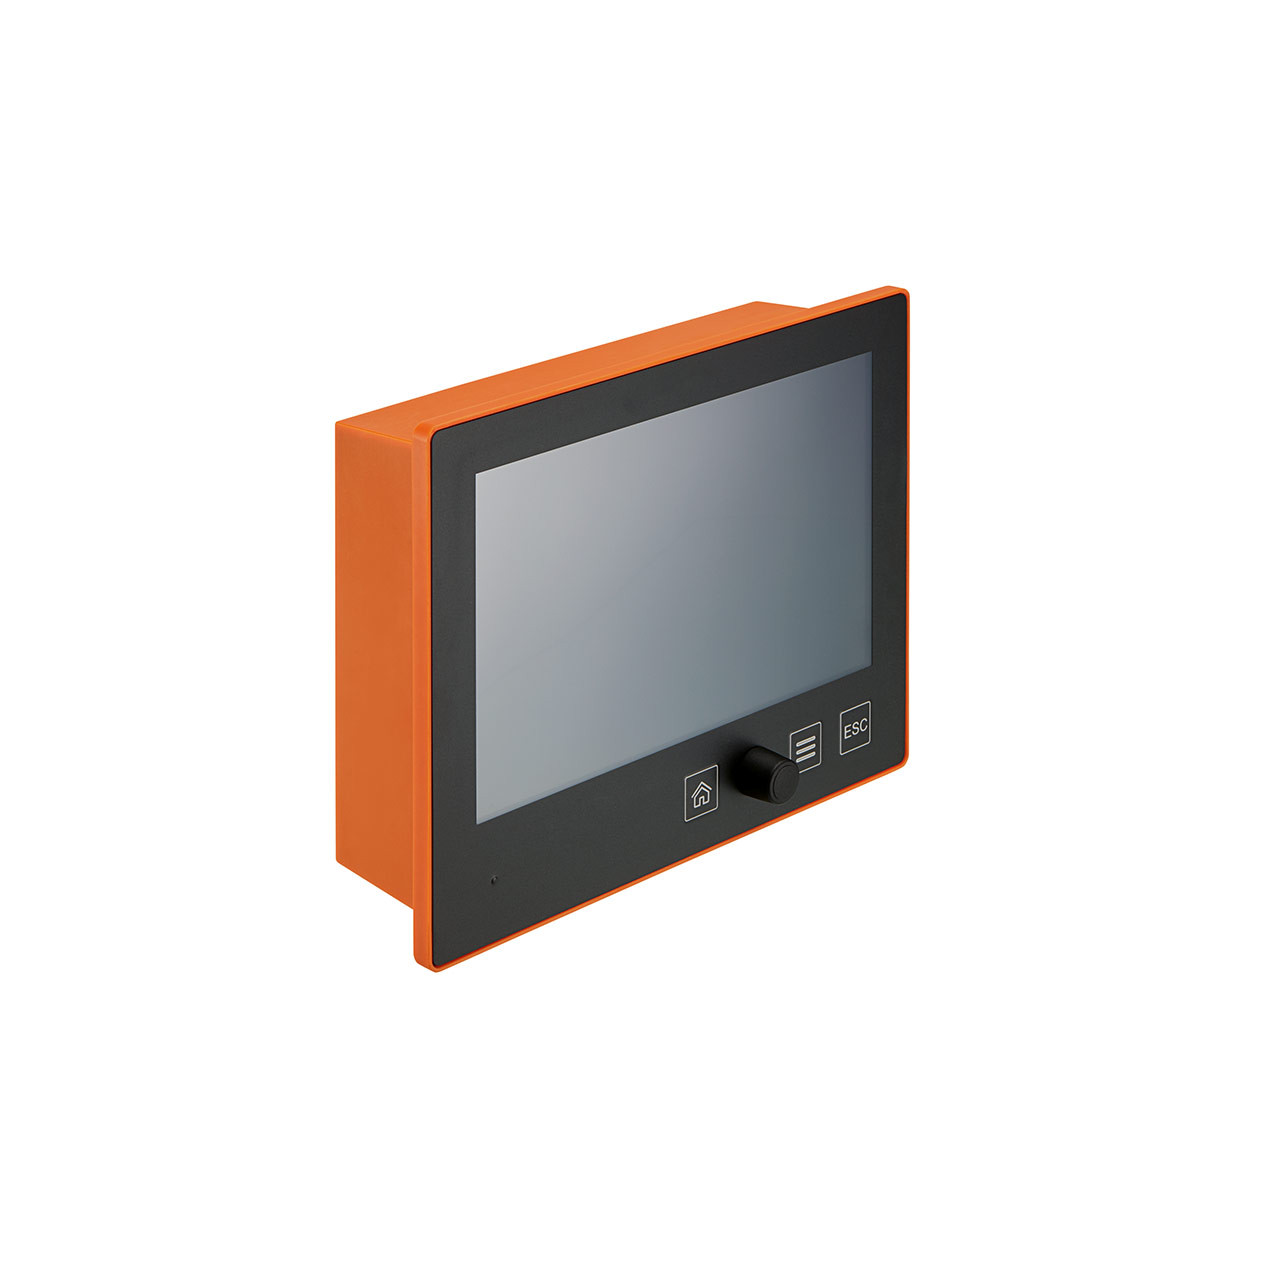 EASYSTICK Computer MZD.5000